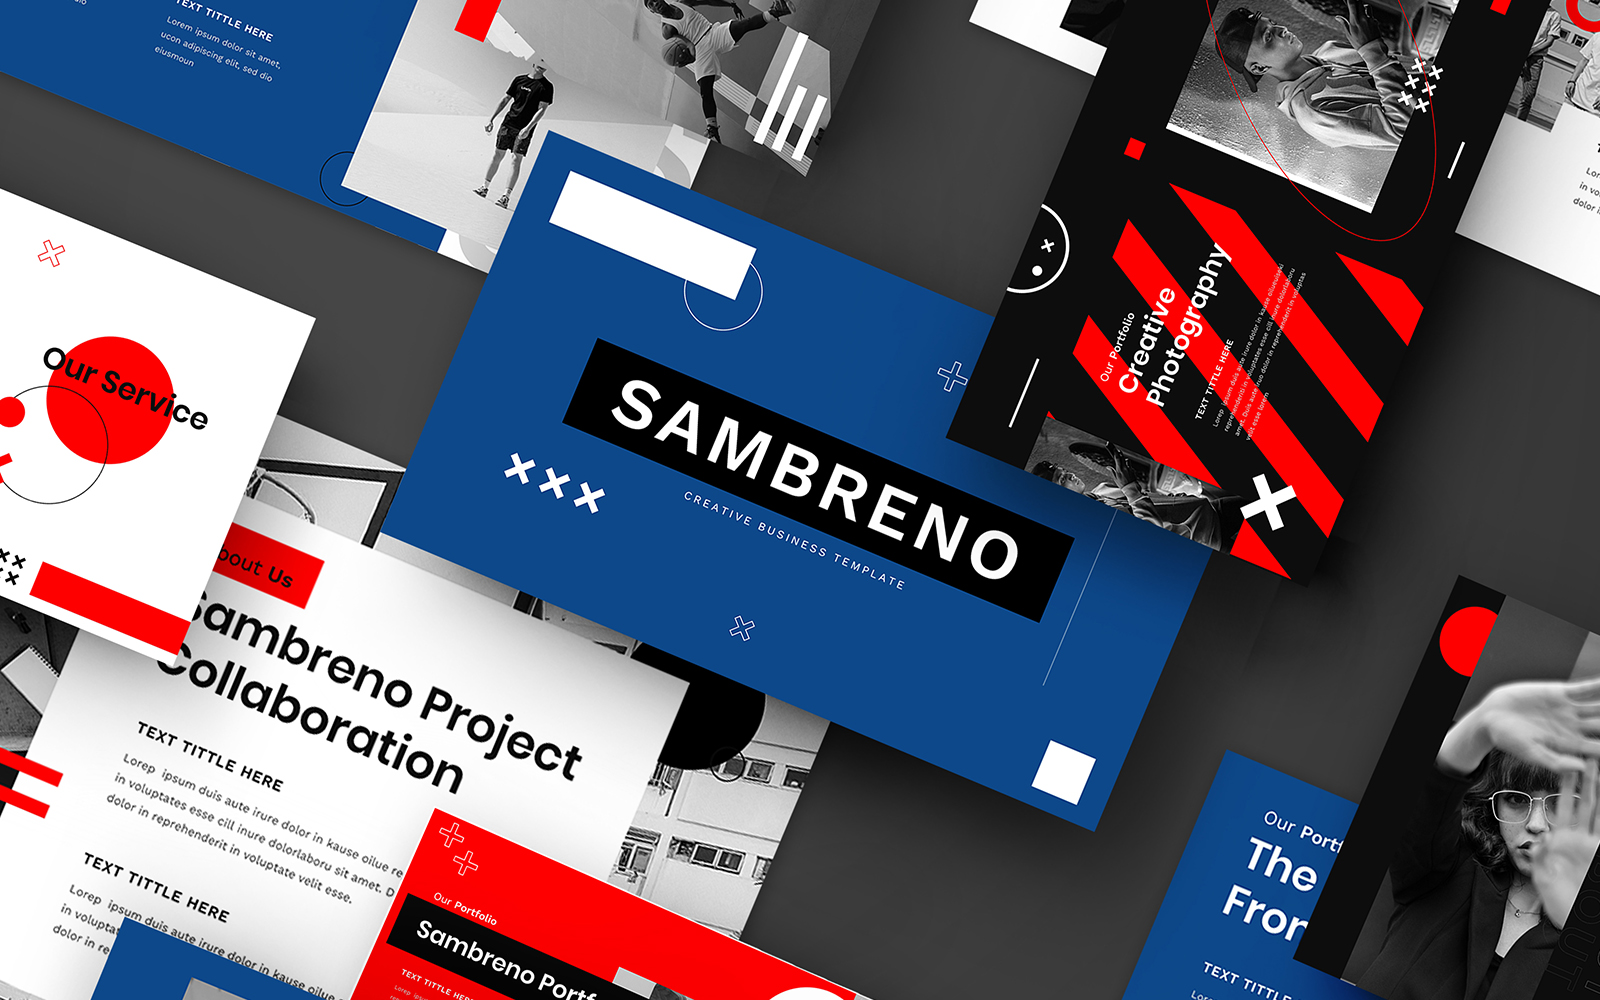 Szablon PowerPoint Sambreno – Creative Business #110285